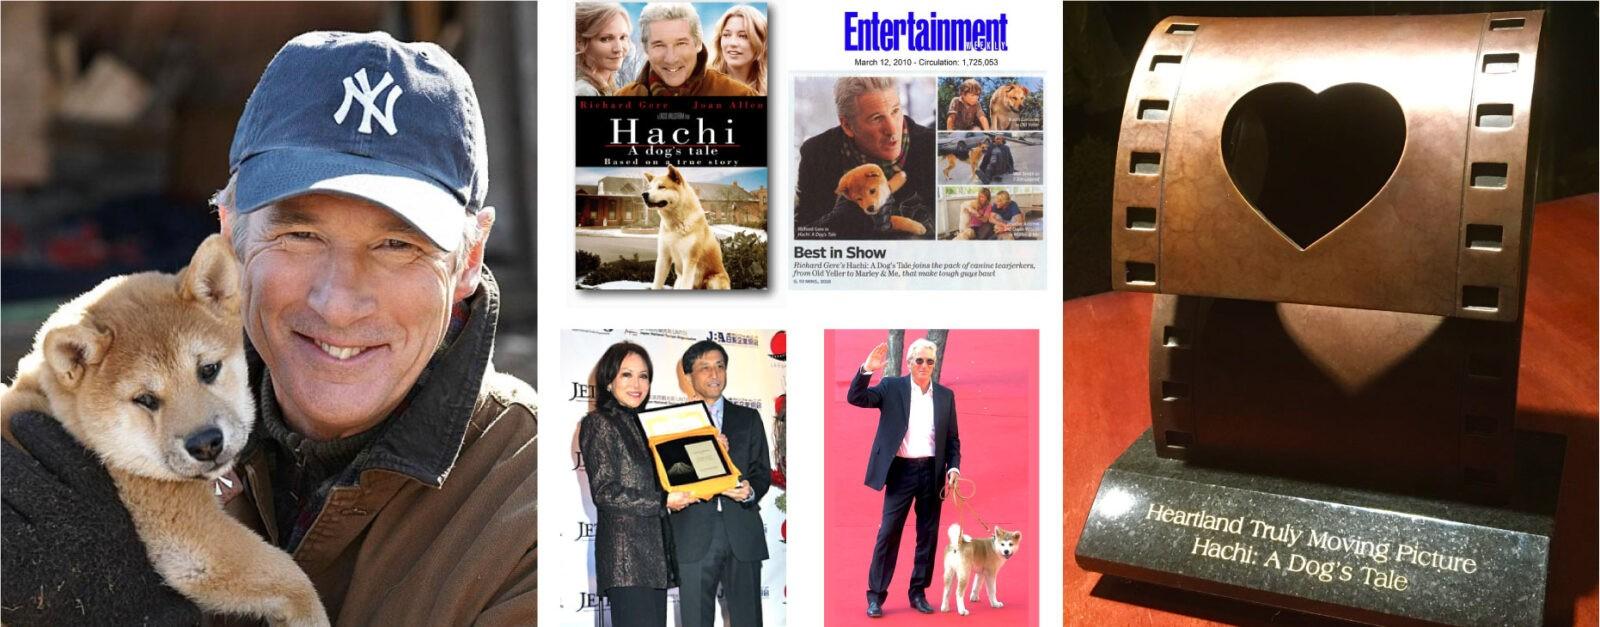 Hachi: A Dog's Tale Richard Gere & Awards